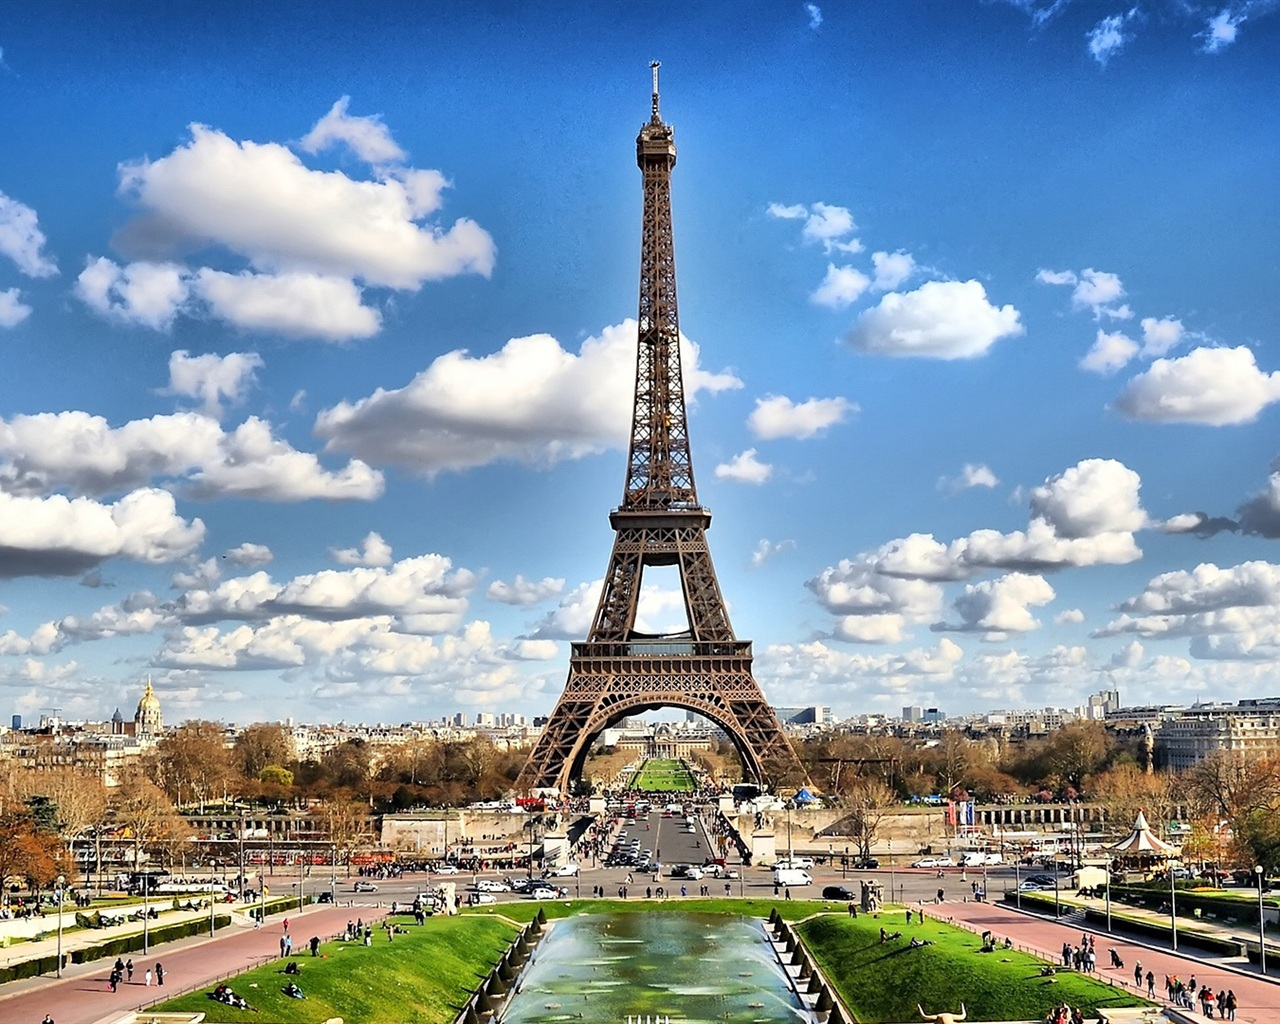 Torre eiffel de parís fondos de pantalla - 1280x1024